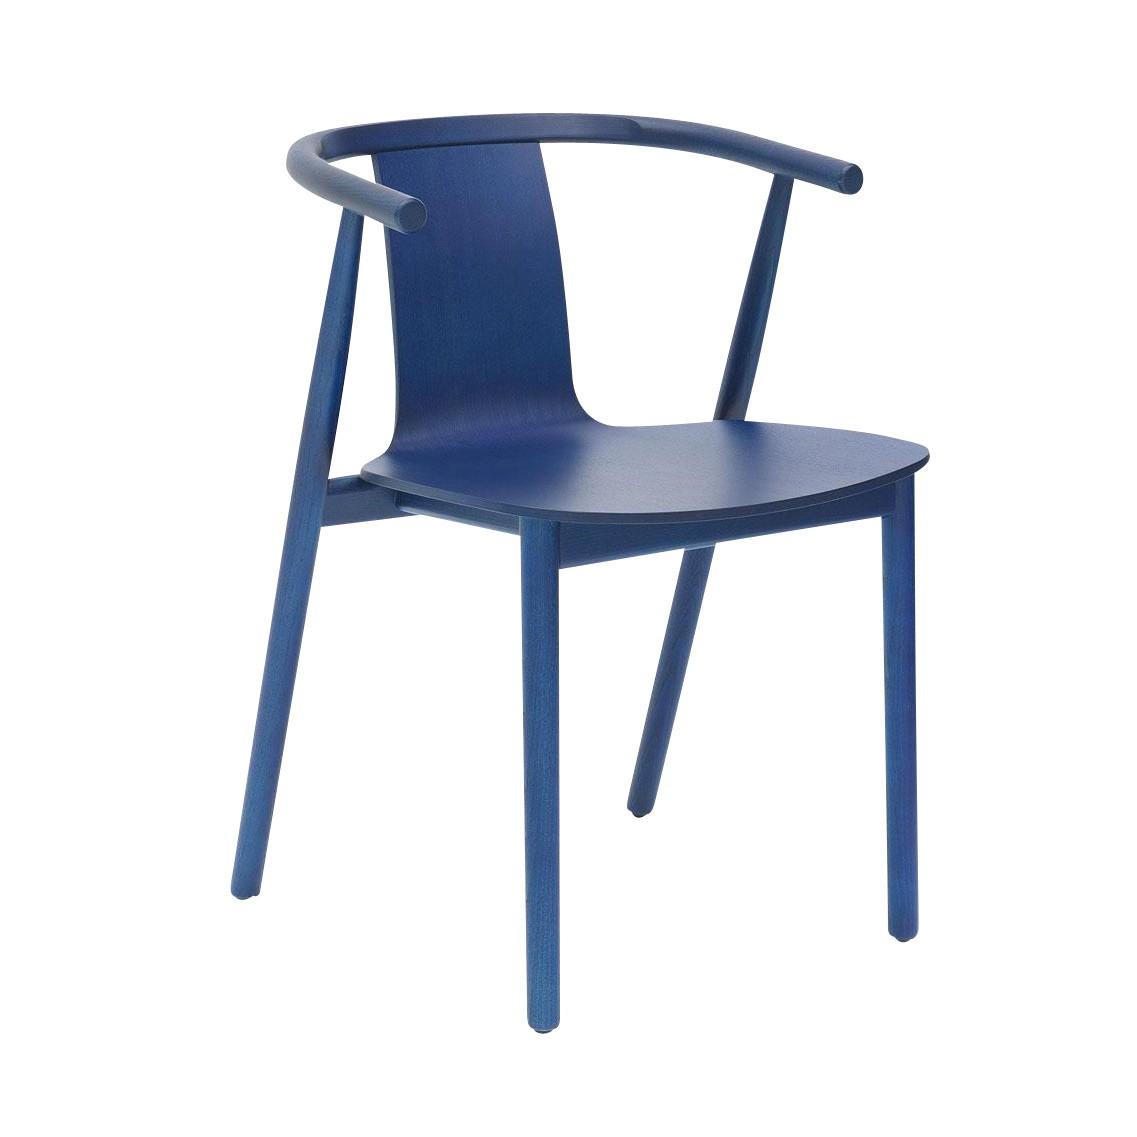 cappellini bac armlehnstuhl ambientedirect. Black Bedroom Furniture Sets. Home Design Ideas